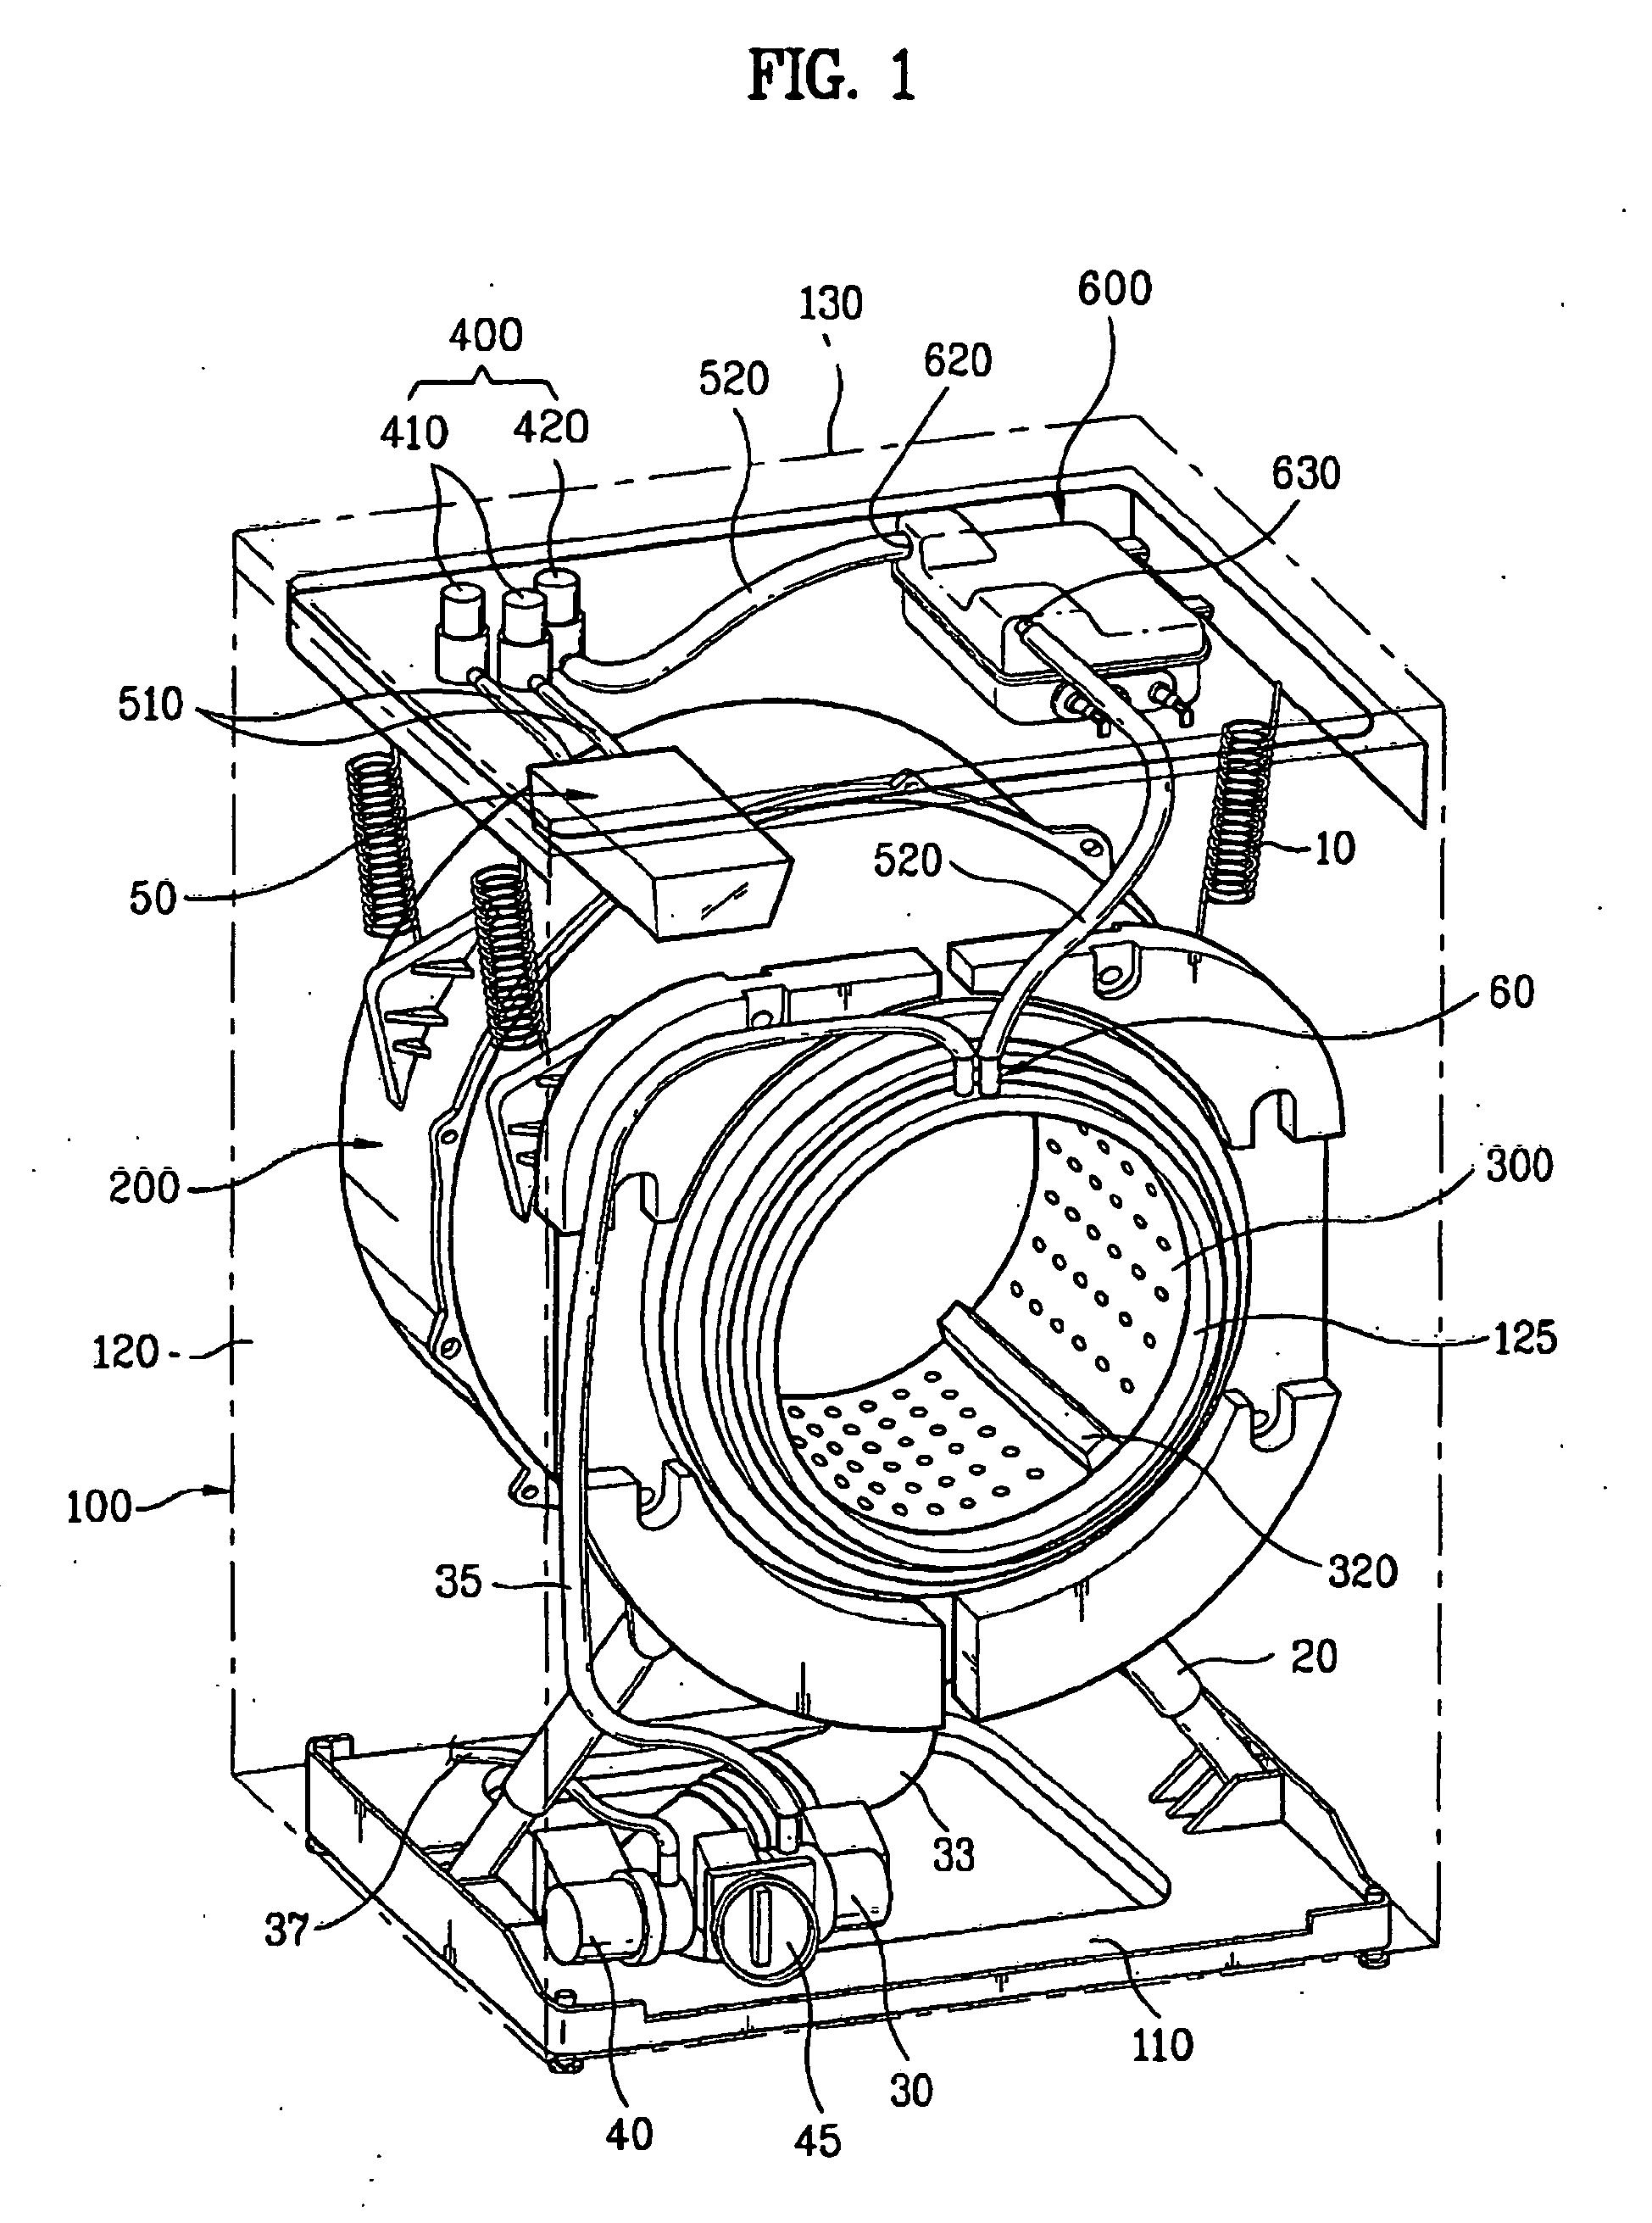 Washing Machine Drawing ~ Patent ep b washing machine and control method